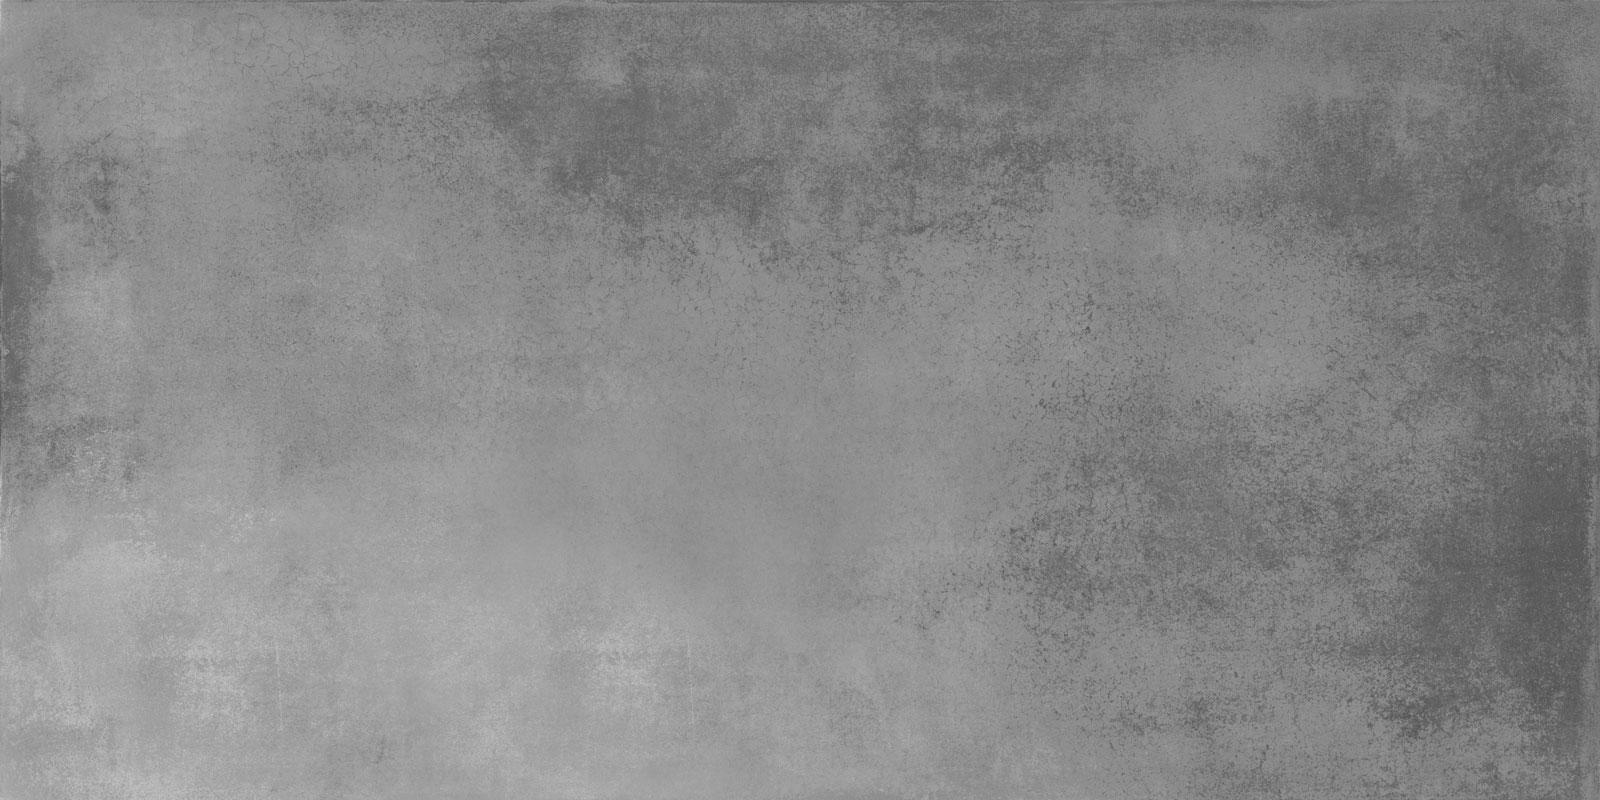 CULT Titan (grau) Image